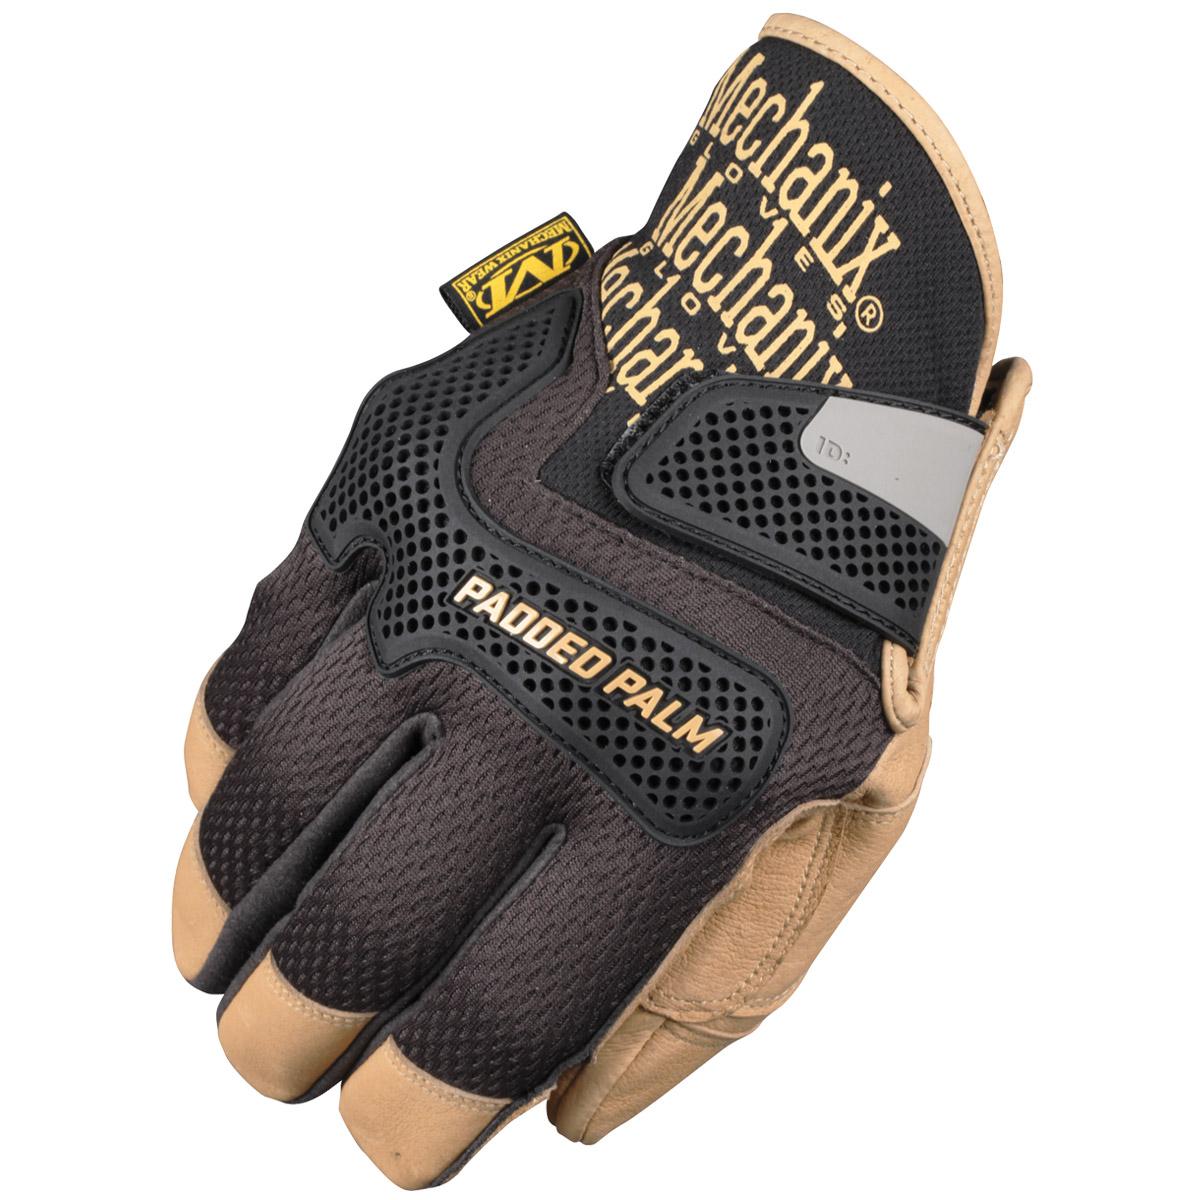 Leather work gloves ebay - Mechanix Wear Cg Padded Palm Mens Genuine Leather